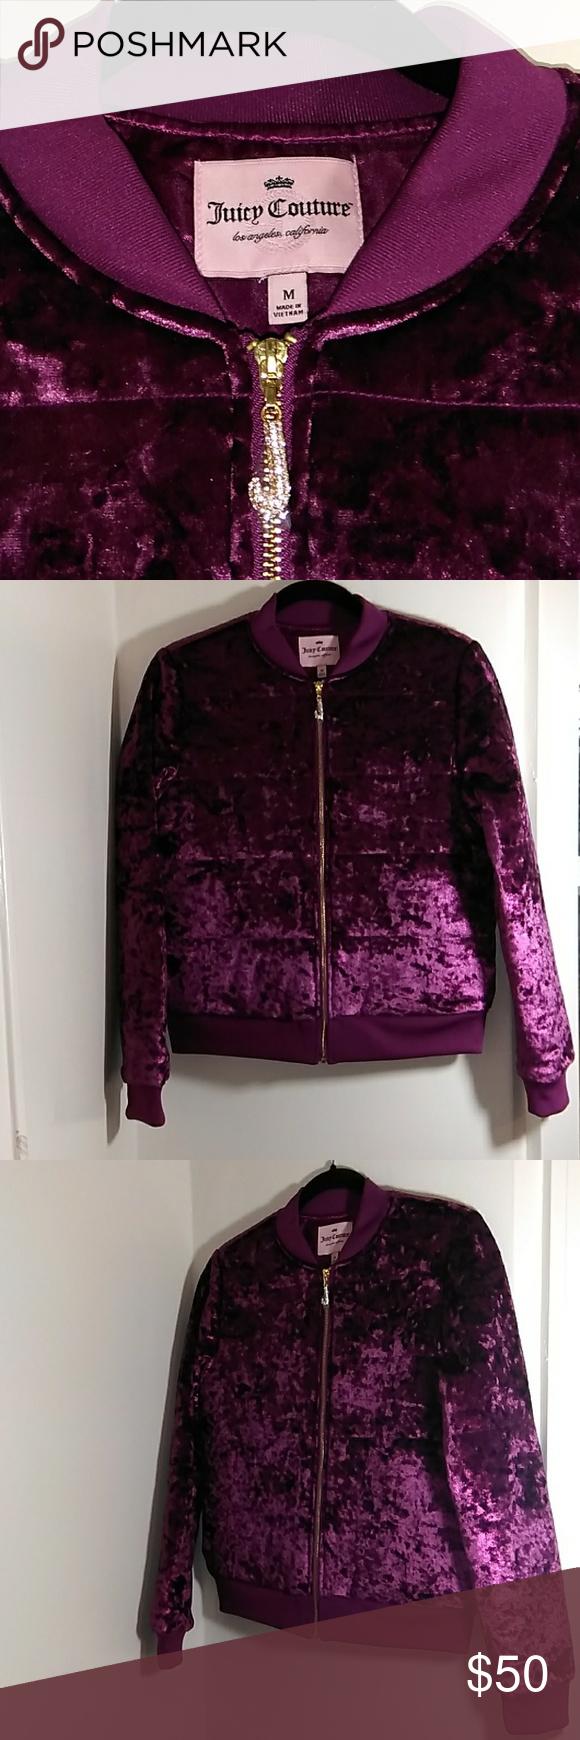 Juicy Couture Purple Bomber Jacket Size M Rn 73277 Juicy Couture Puple Velvet Size M Zip Up Velvet Satin Lined Purple Bomber Jacket Juicy Couture Bomber Jacket [ 1740 x 580 Pixel ]